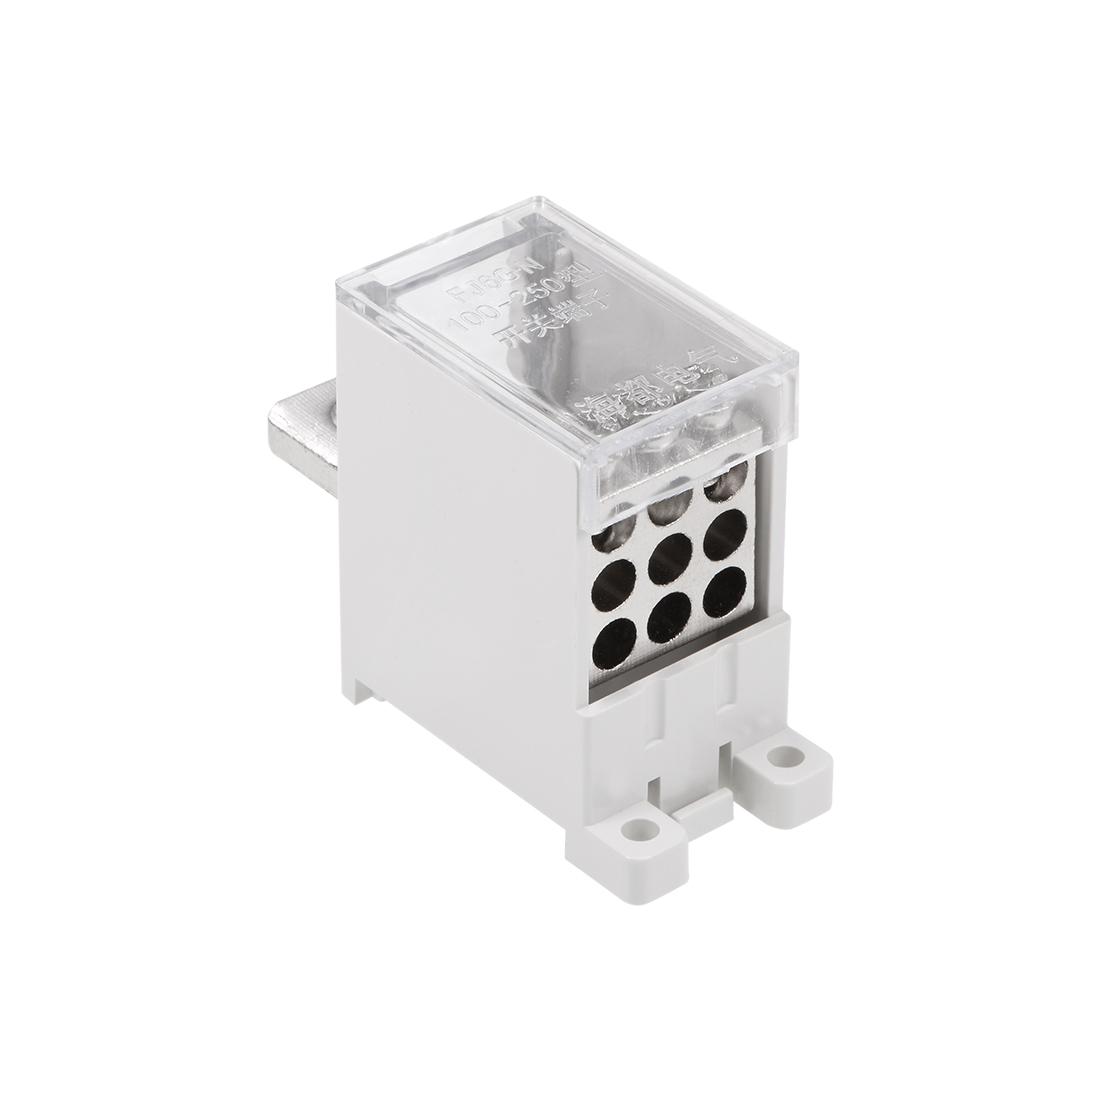 1 In 9 Out DIN Rail Terminal Blocks 250A Max Input Distribution Block